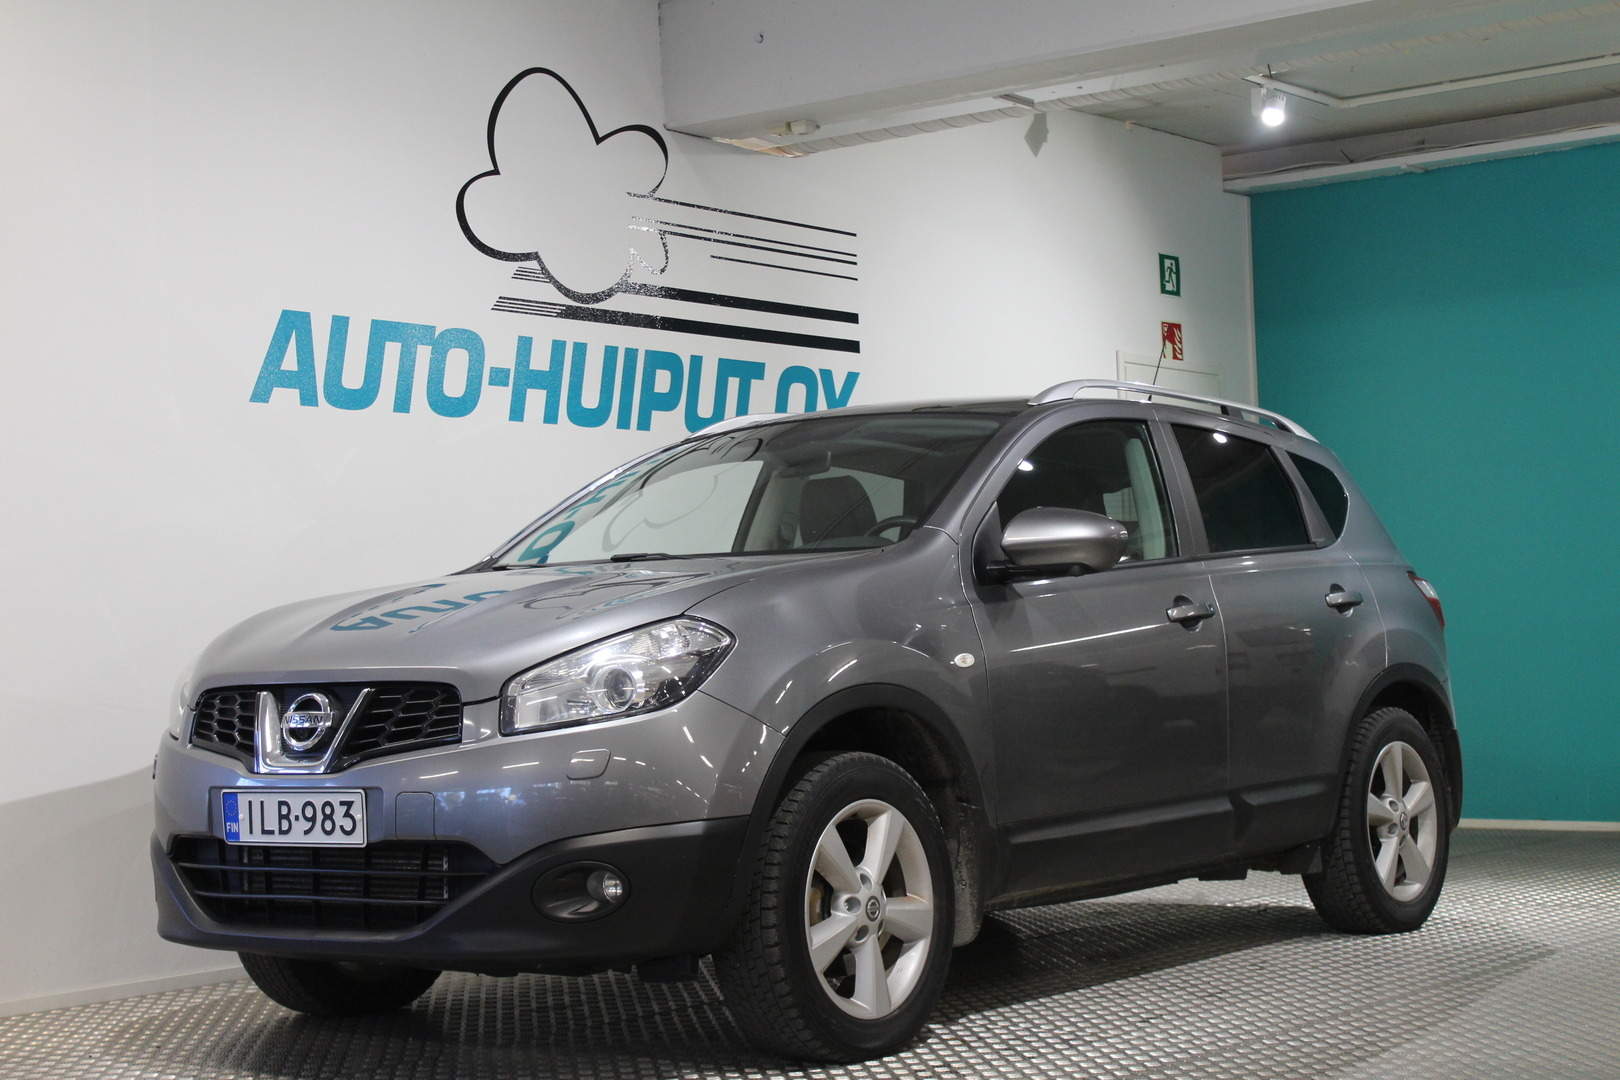 Nissan Qashqai, 16dCi s/s Tekna 4WD Elegance #Hirmu varusteet! #Nopeimmalle!